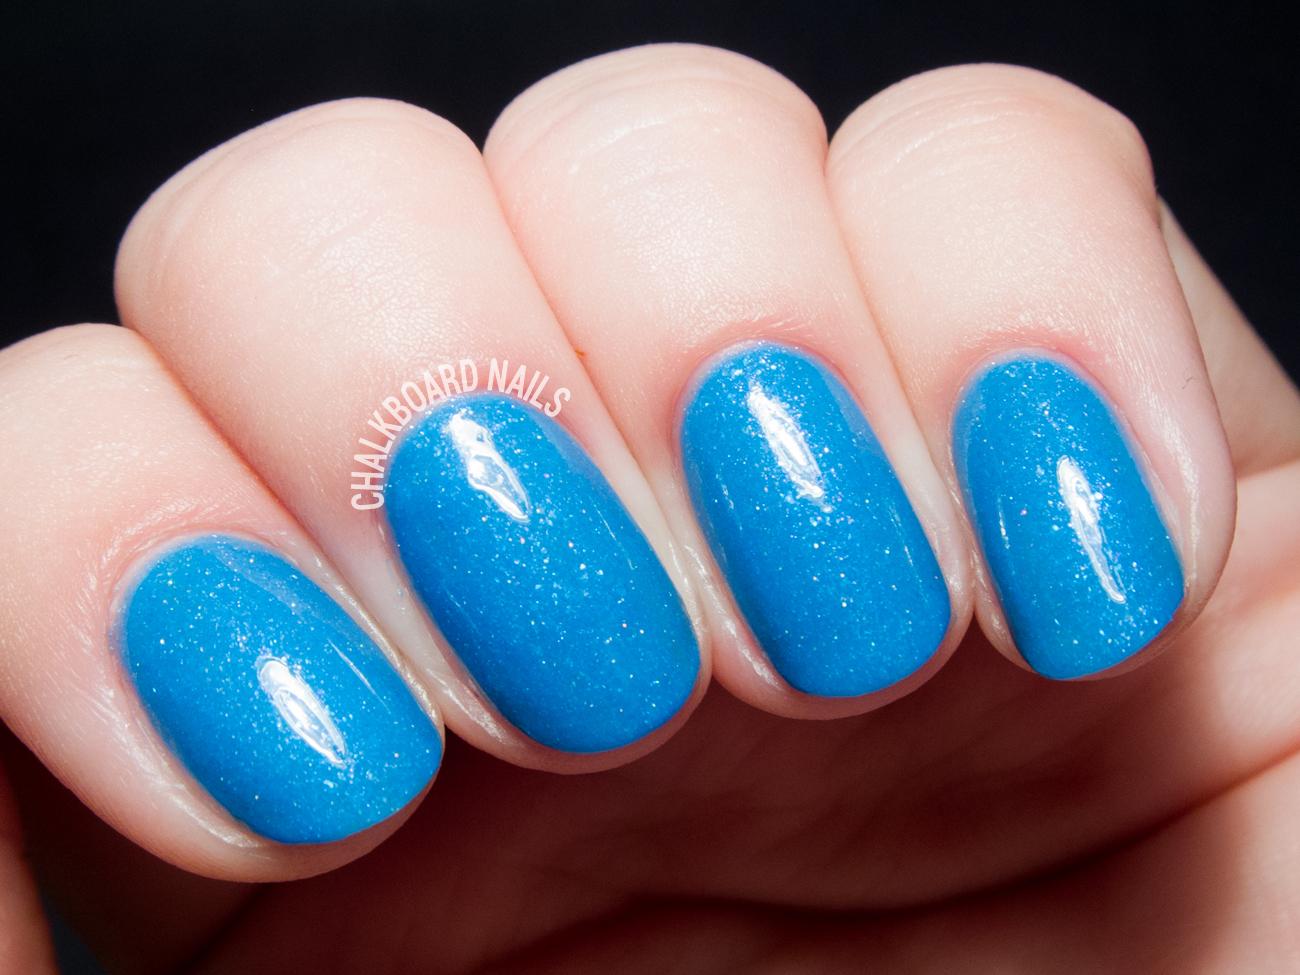 Serum No. 5 Glo-balt Blue via @chalkboardnails